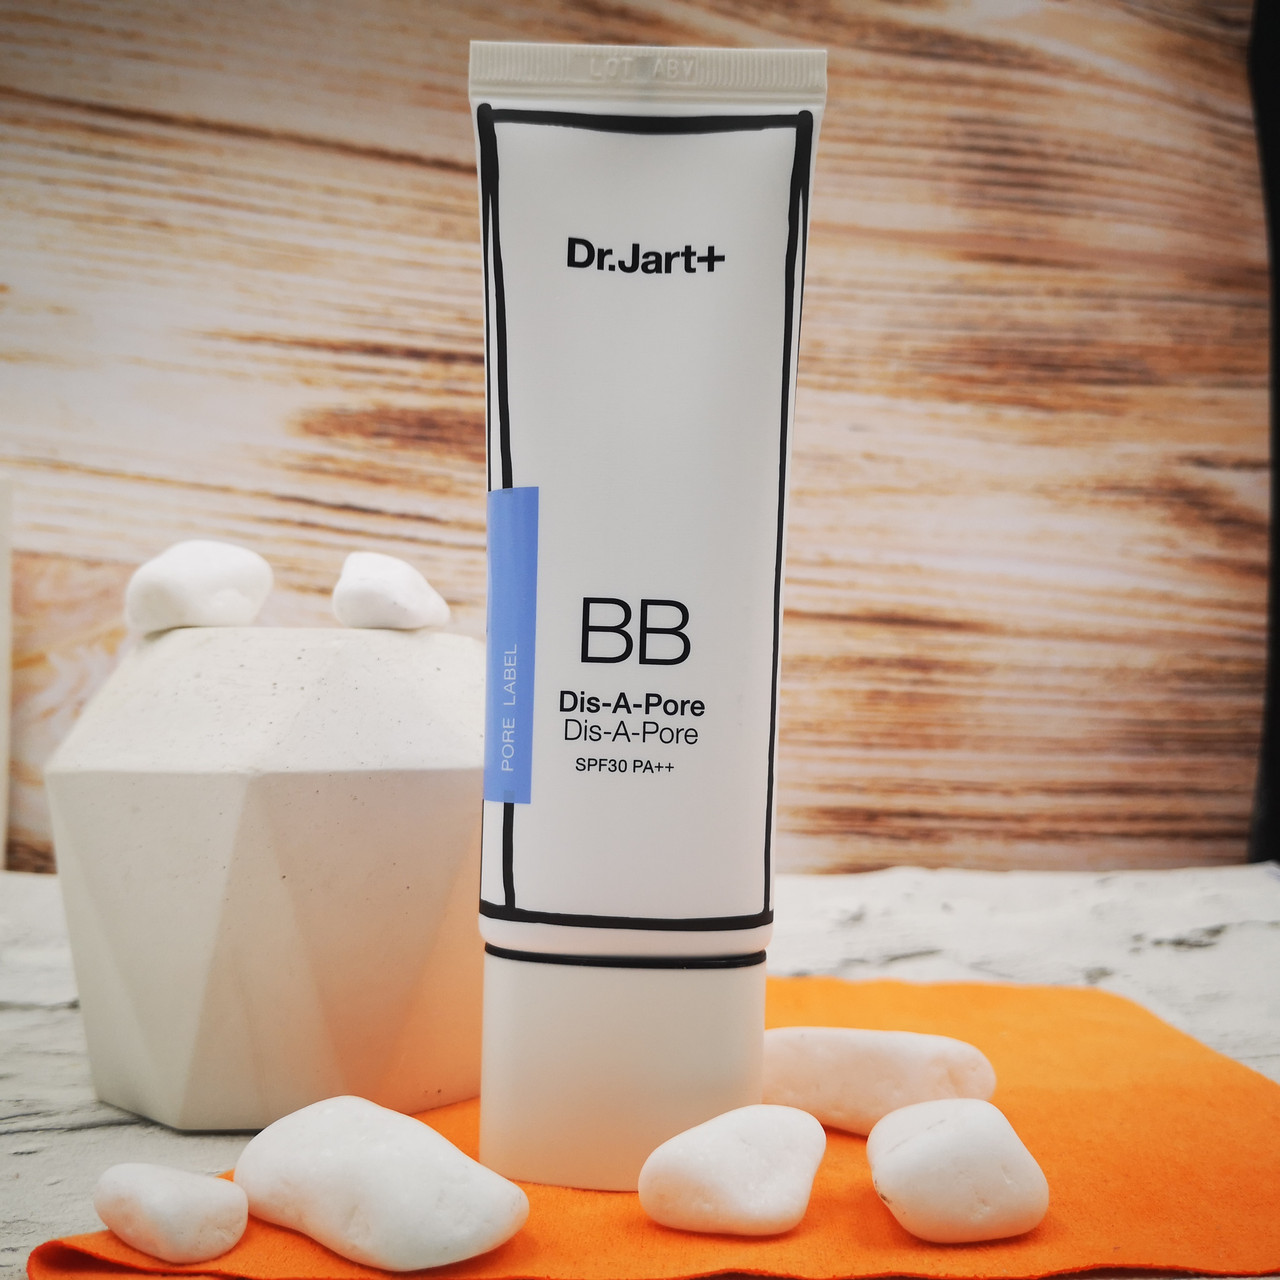 BB крем Dr. Jart+ для кожи с расширенными порами Dis-A-Pore Beauty Balm SPF30 PA++ (Blue)